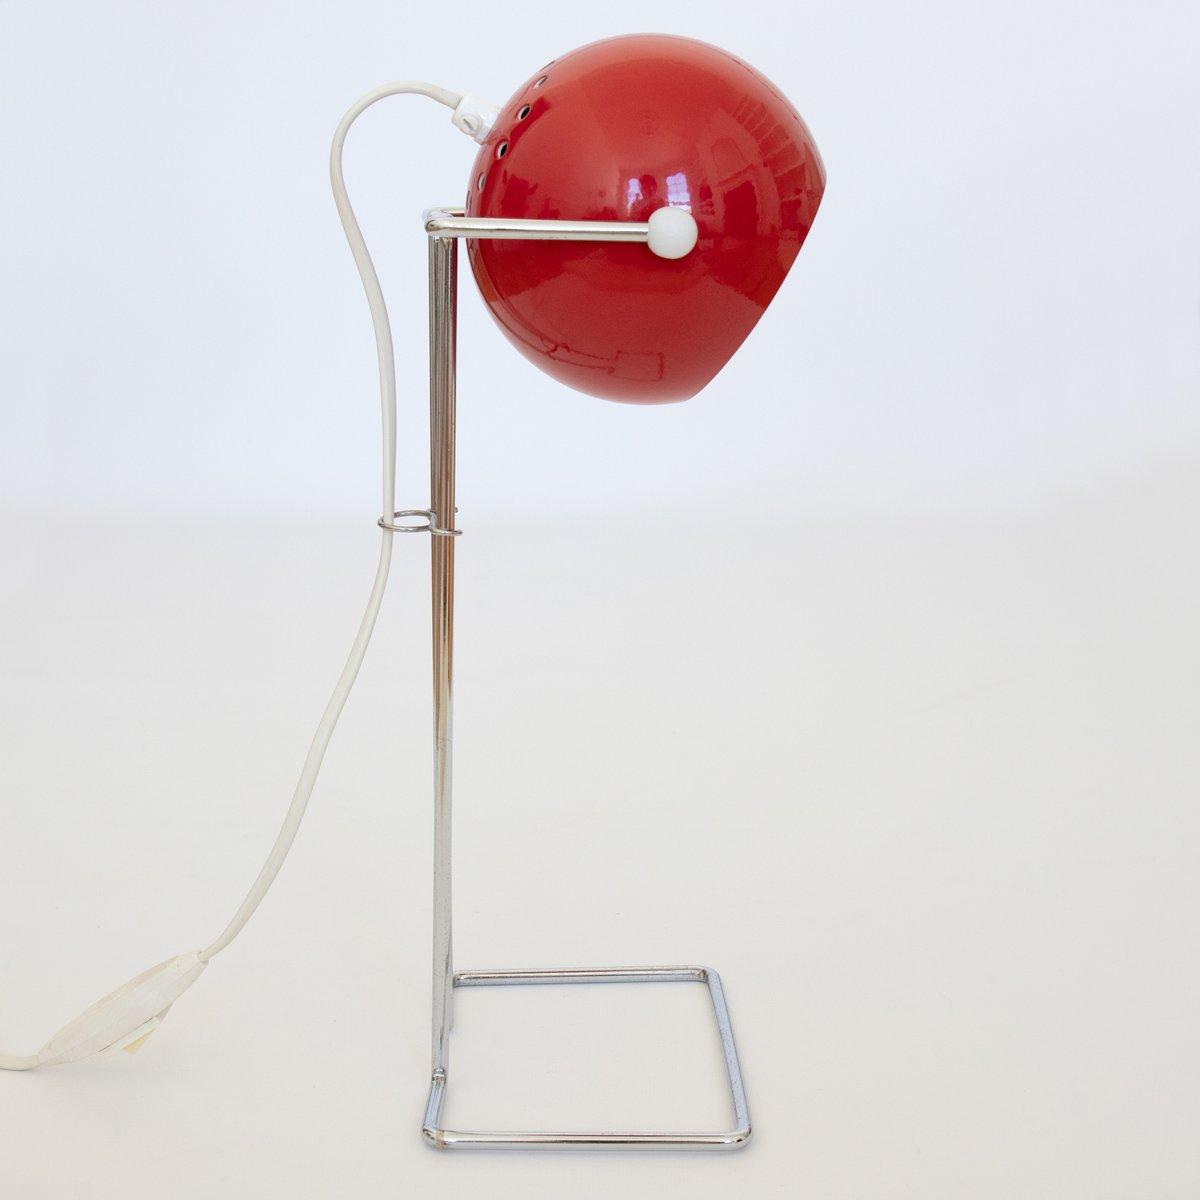 Danish Pop Art Bubble Lamp In Red By P Bosque For Abo Randers 1970s Miniso Golf Desk 12000